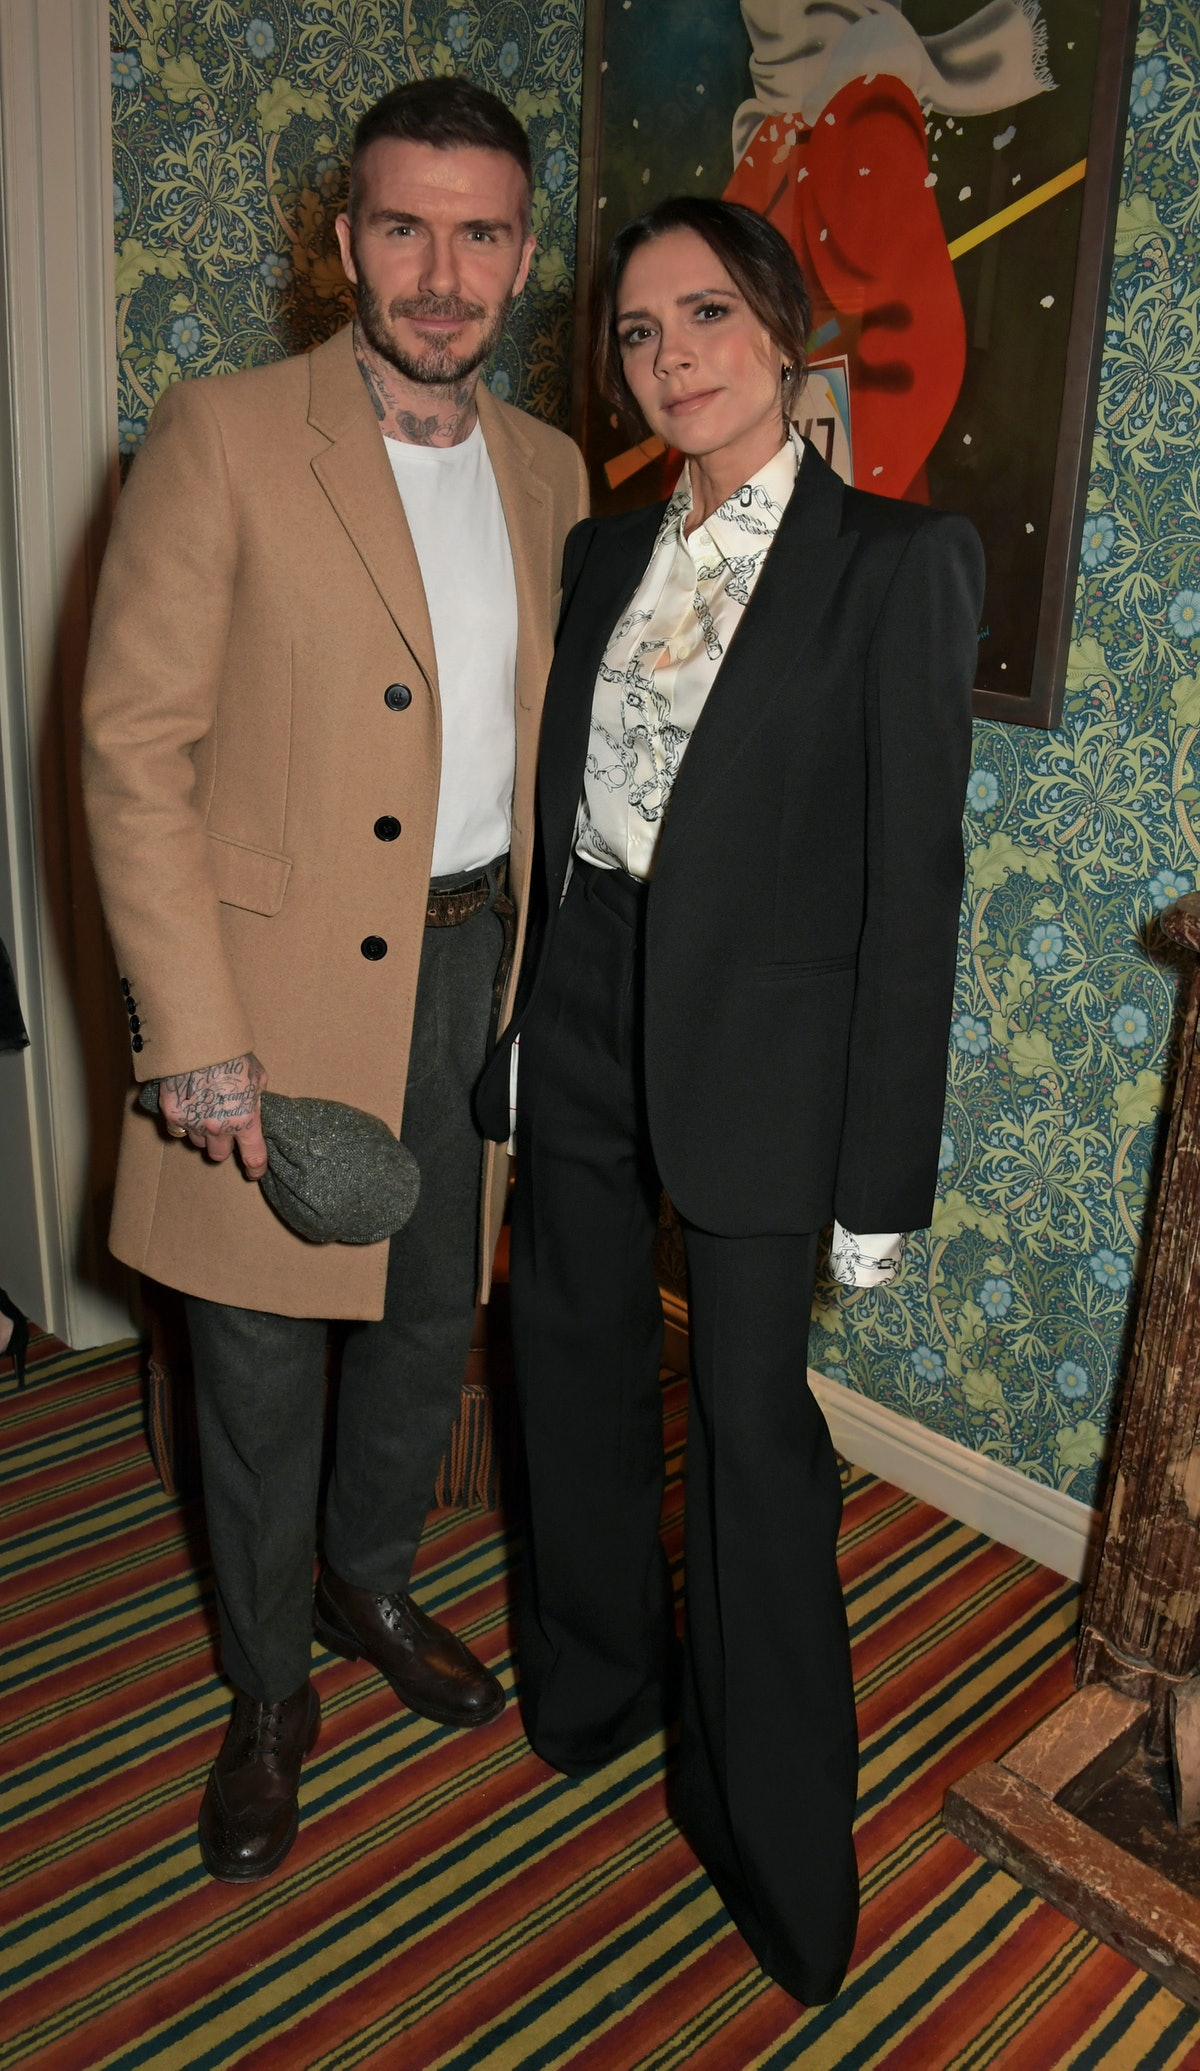 Victoria Beckham x YouTube Fashion & Beauty After Party At London Fashion Week Hosted By Derek Blasberg & David Beckham